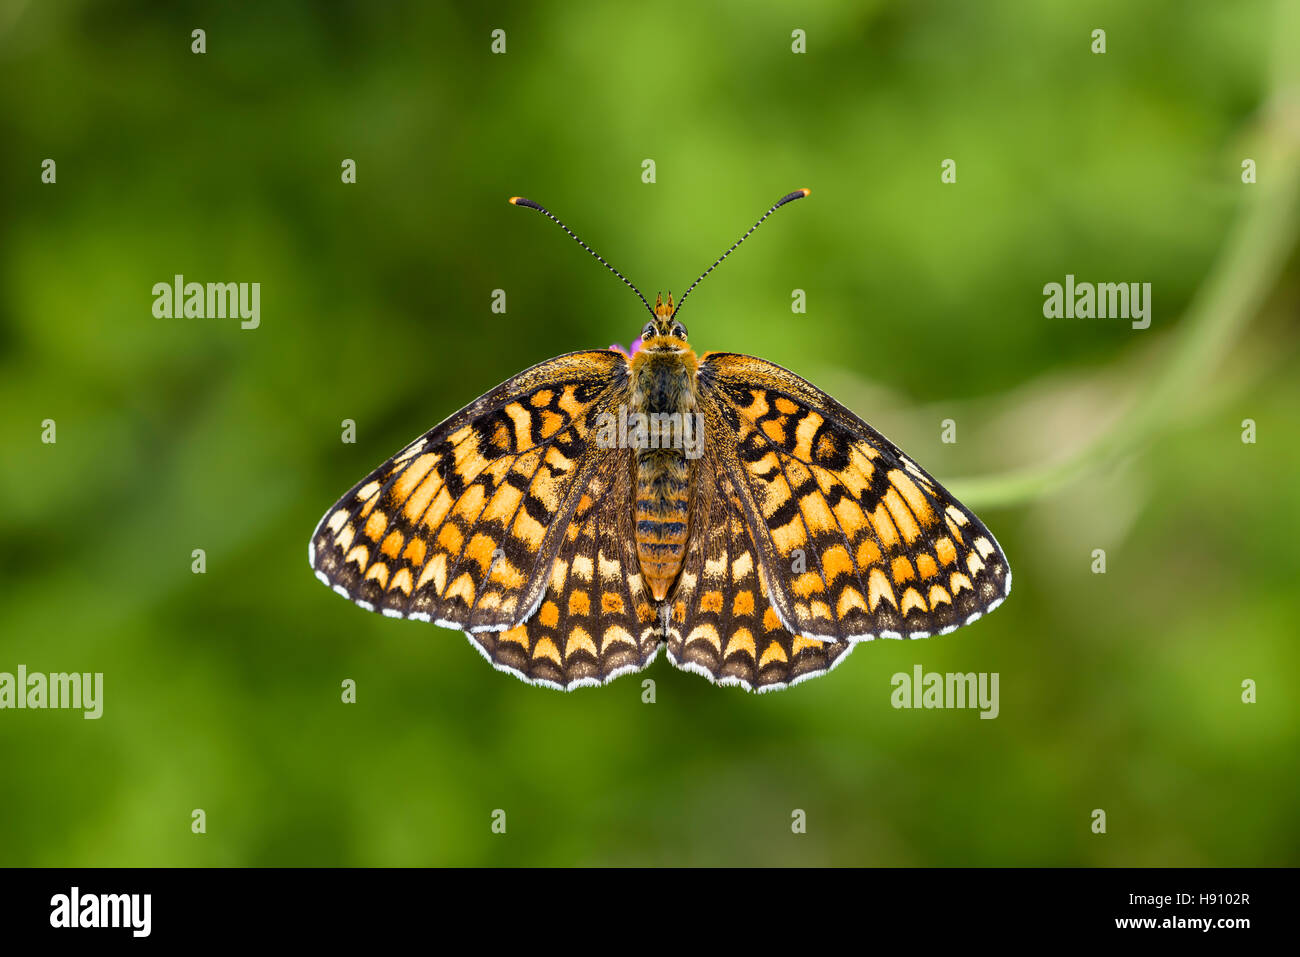 Flockenblumen Scheckenfalter, Melitaea phoebe, centaurée maculée Fritillary Butterfly Photo Stock